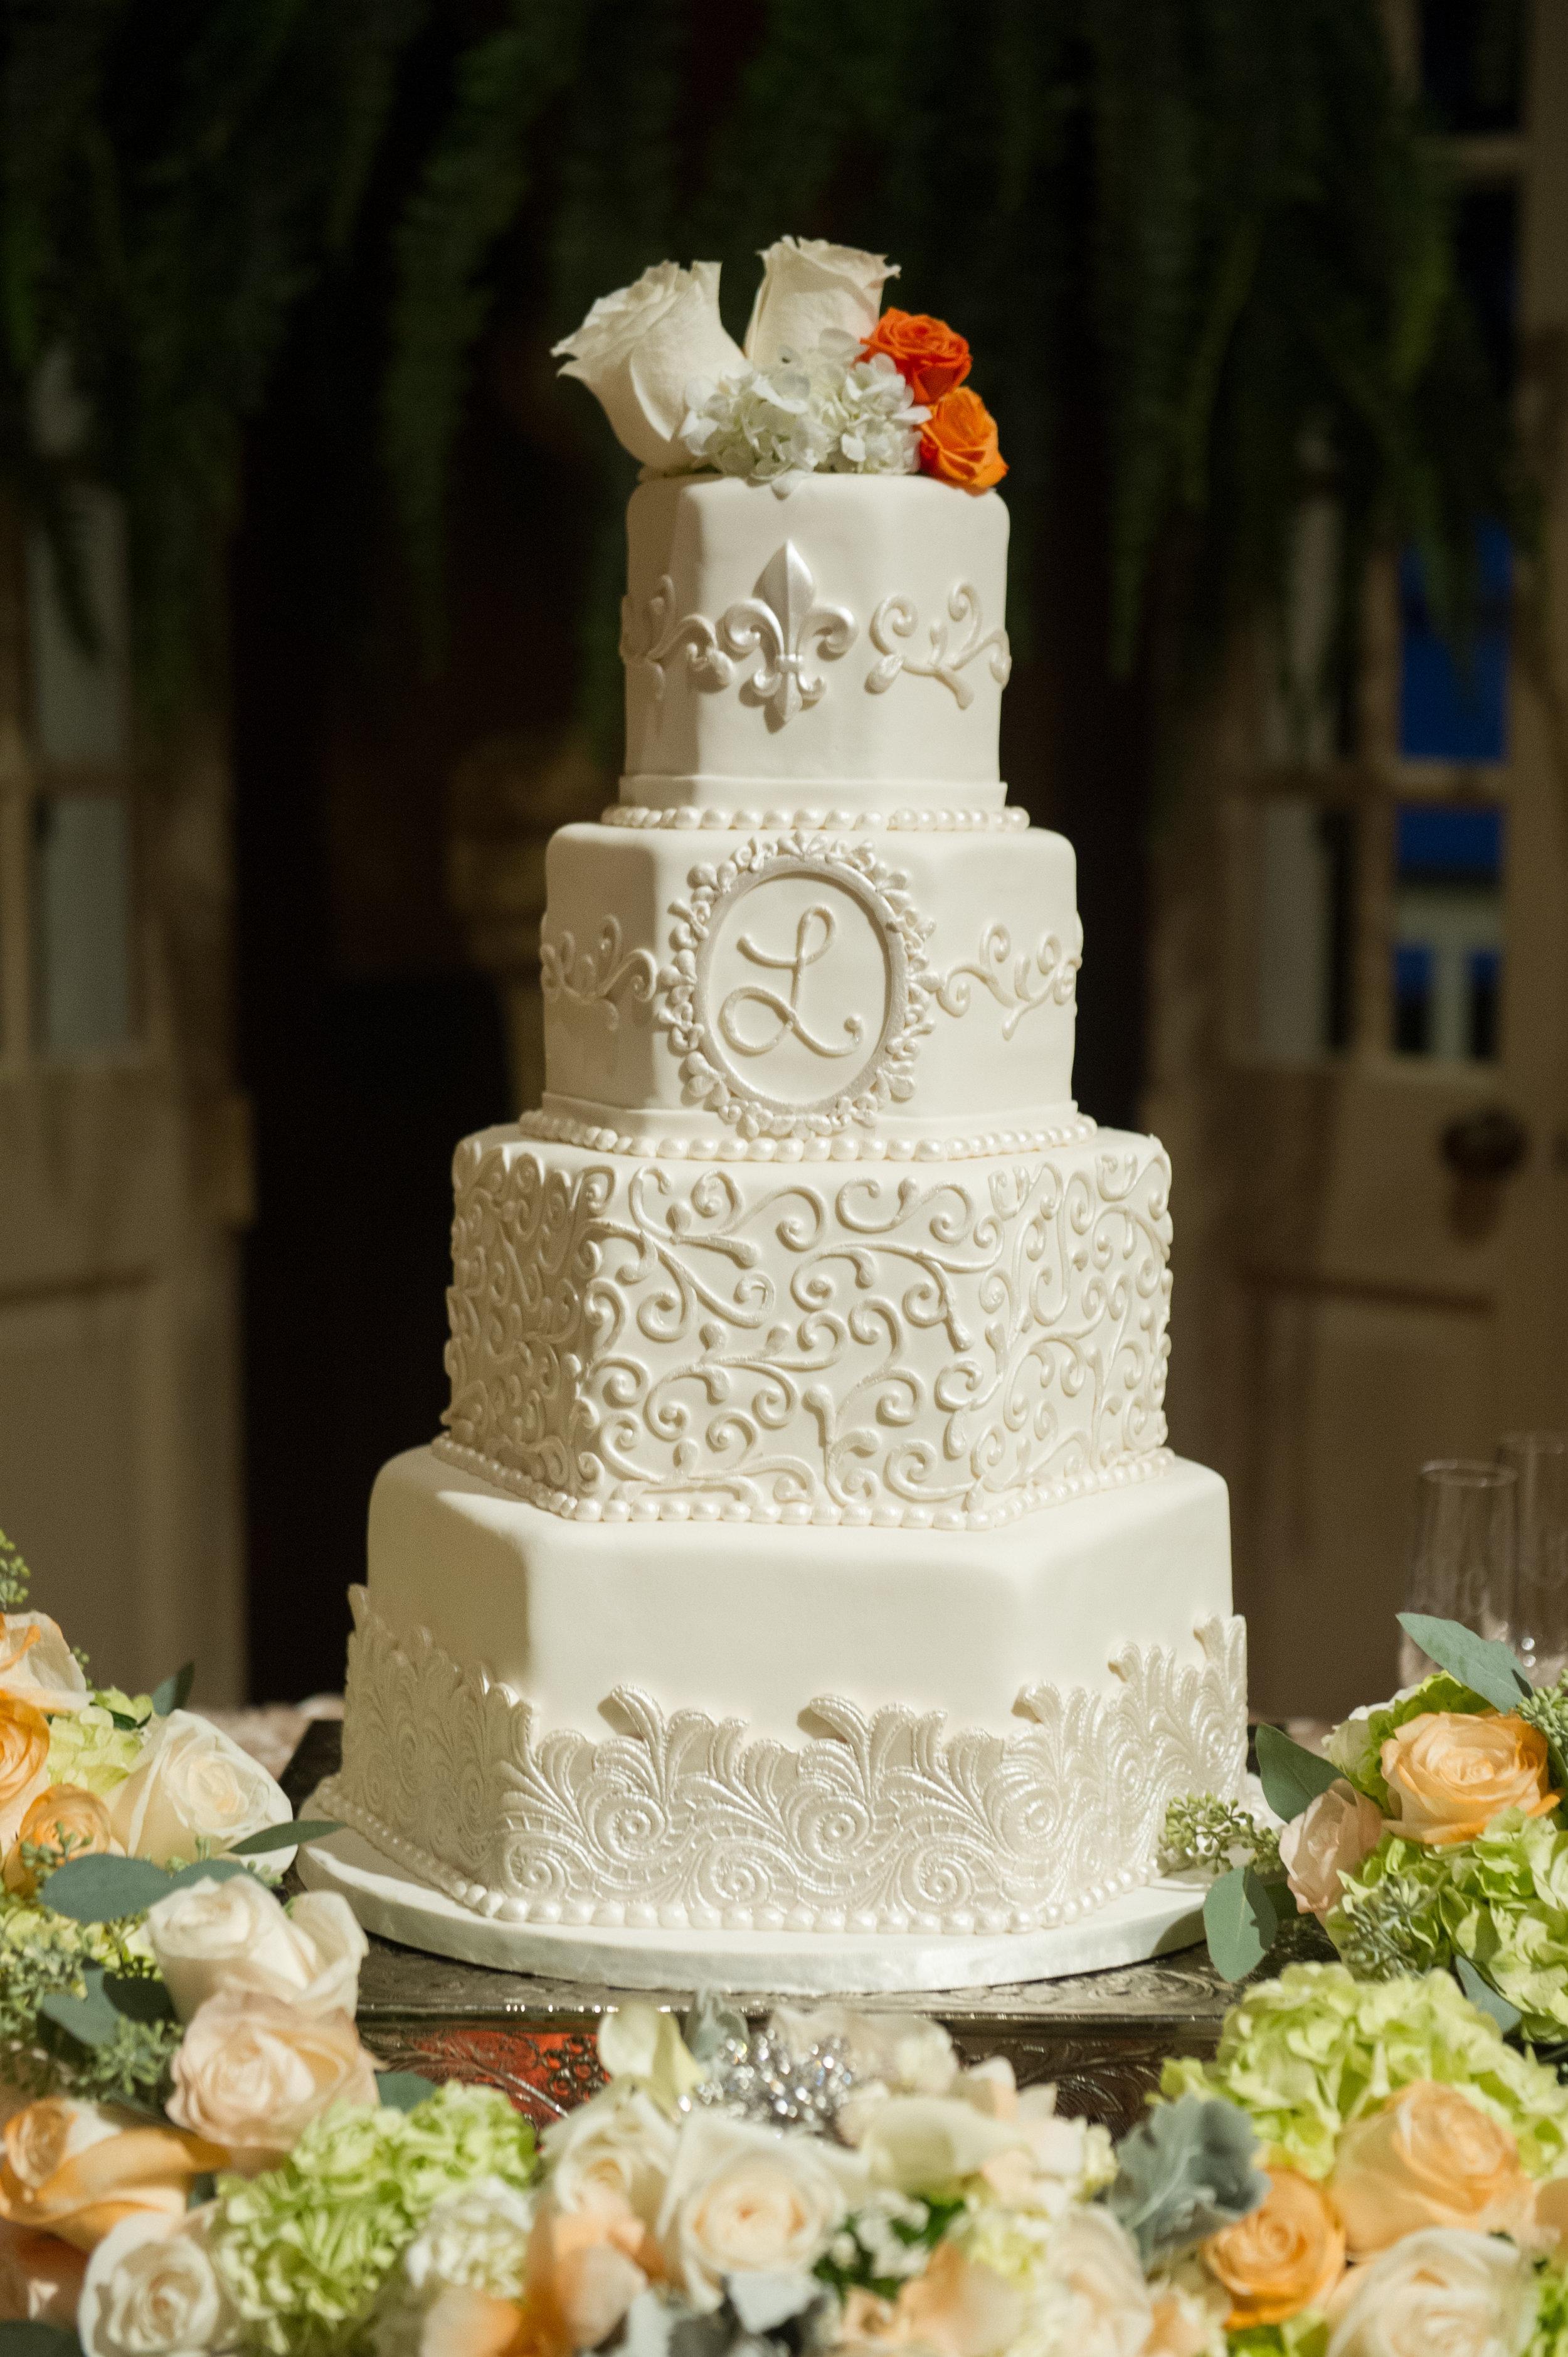 WeddingCake+4tier+FleurDeLis+Flourish.jpg